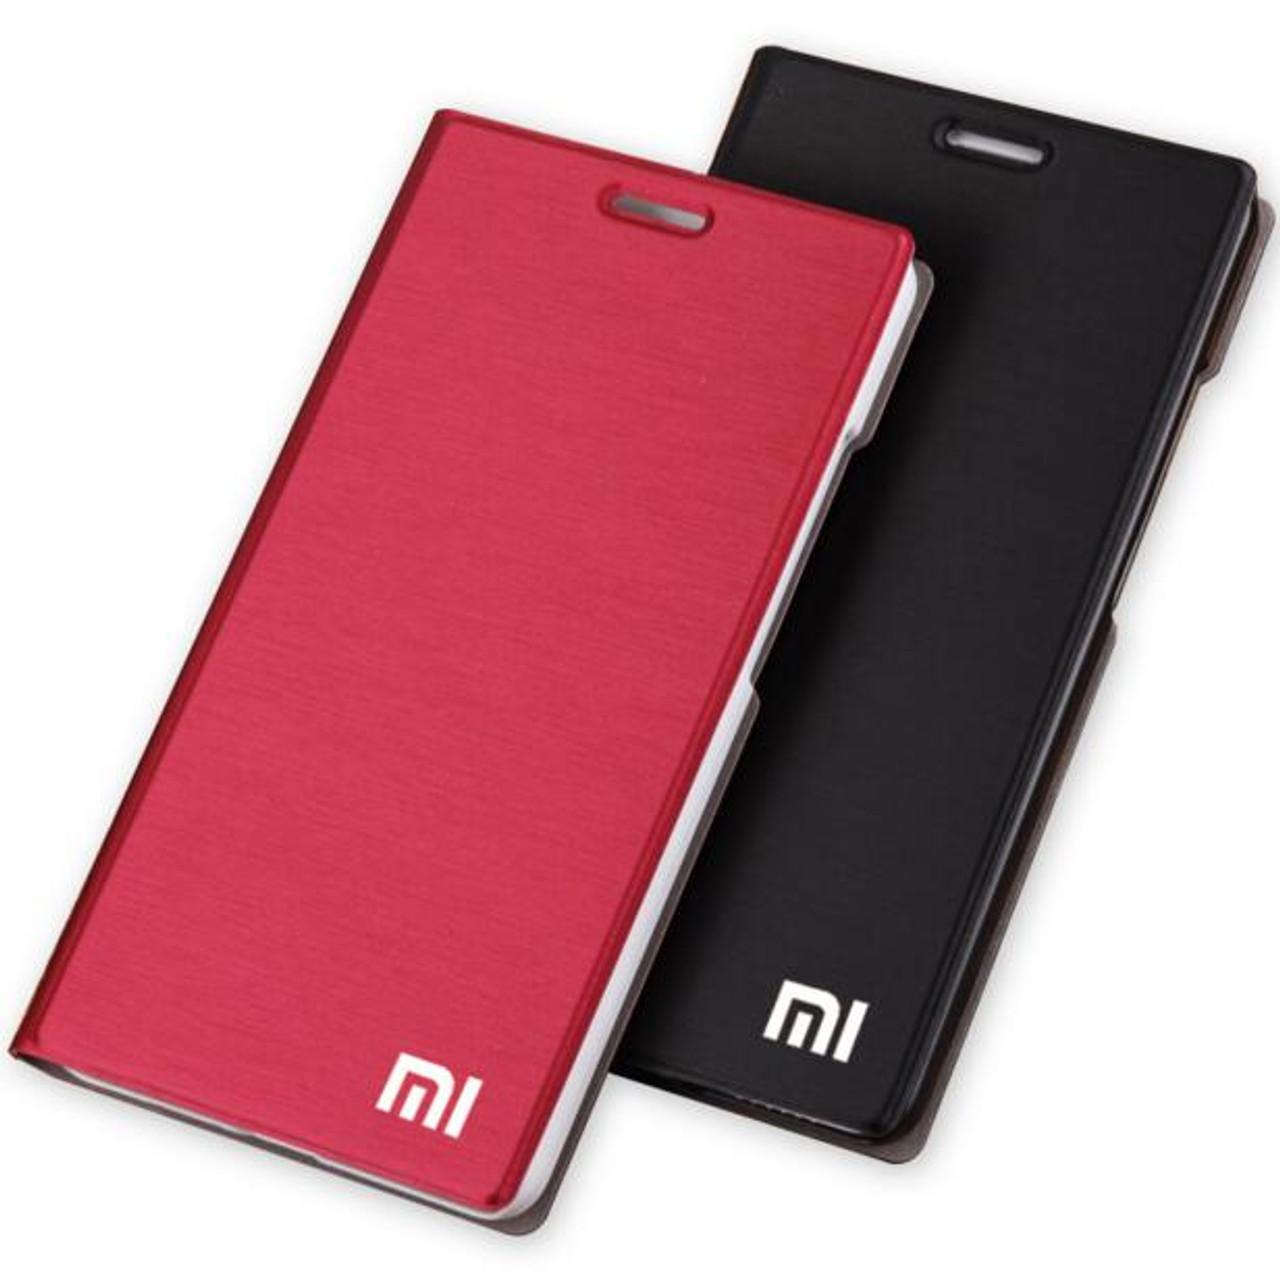 new products 3ac2c 33e62 Xiaomi mi redmi note 4 4x 4A Case Leather Cover Luxury Flip Stand Original  For Xiaomi redmi 4X 4A pro 4X Prime ,OEM product Case